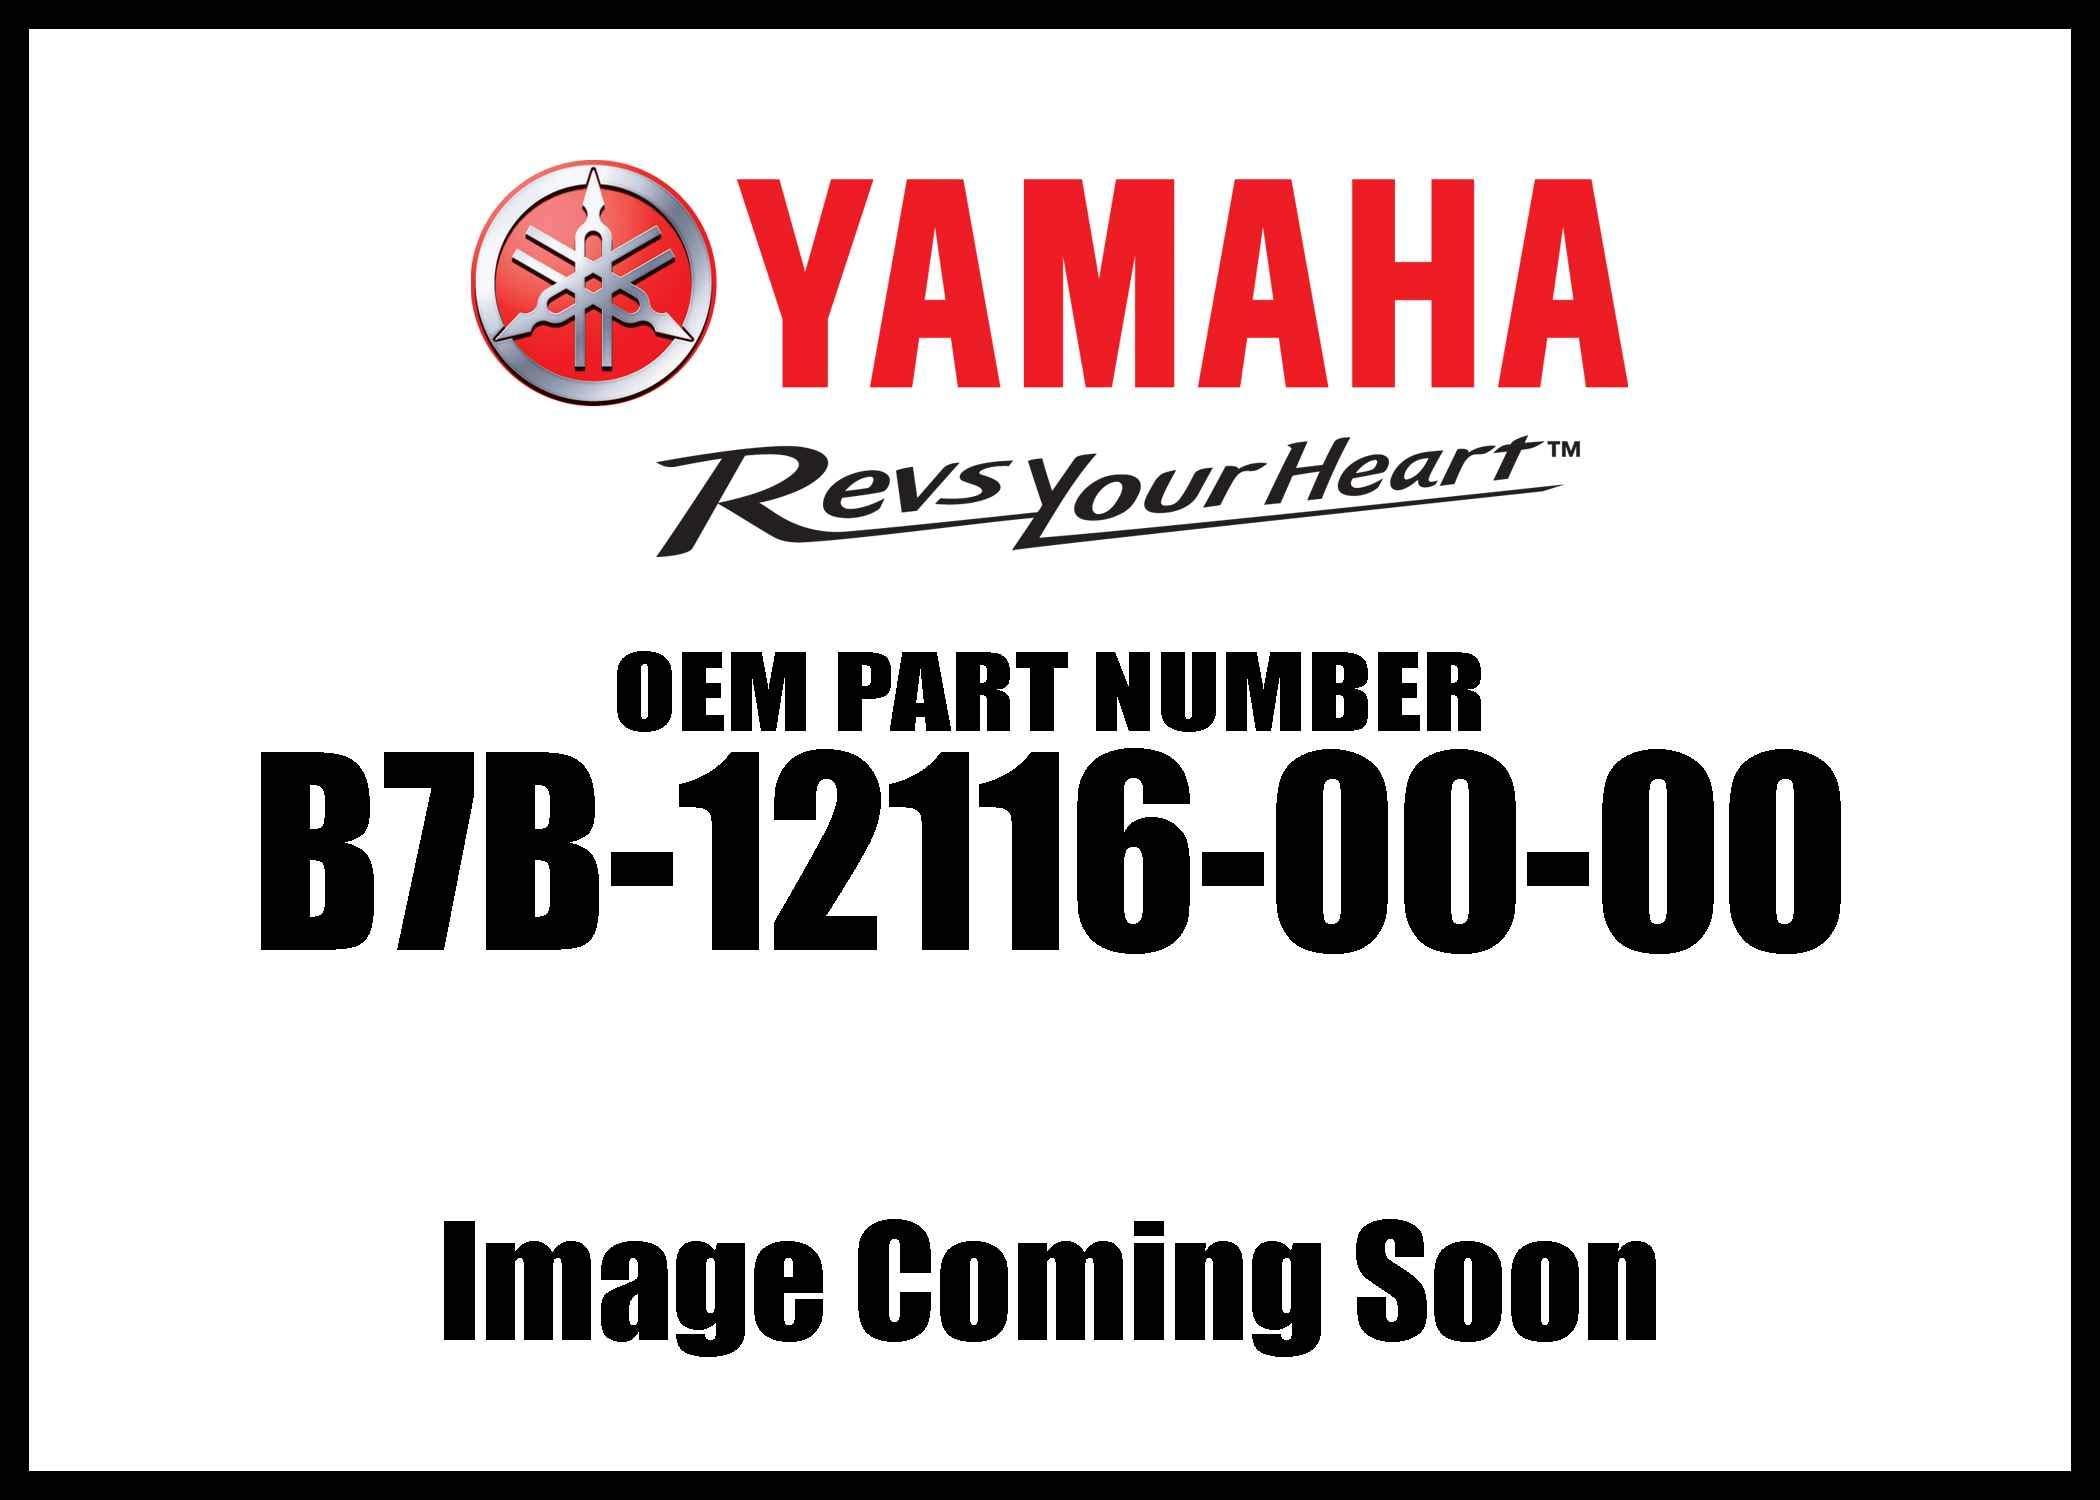 Yamaha Seat Valve Spring B7b-12116-00-00 New Oem